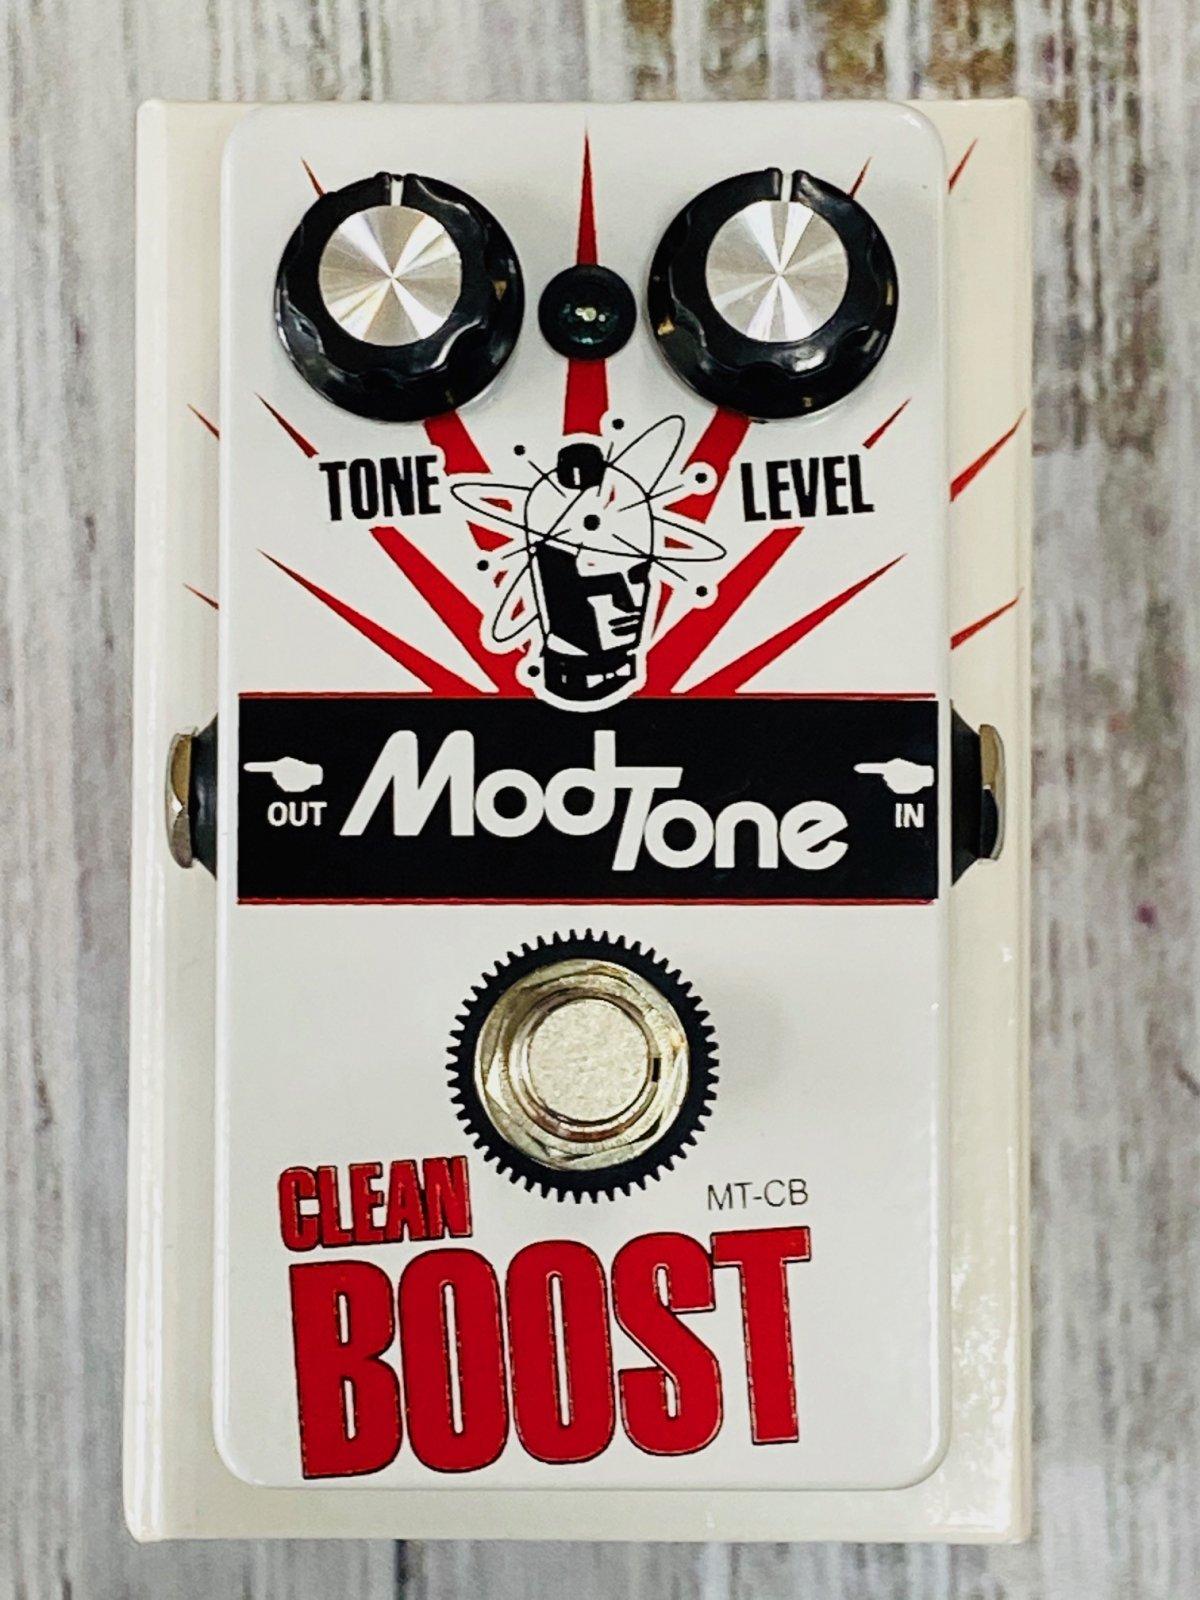 Modtone MT-CB Clean Boost Pedal